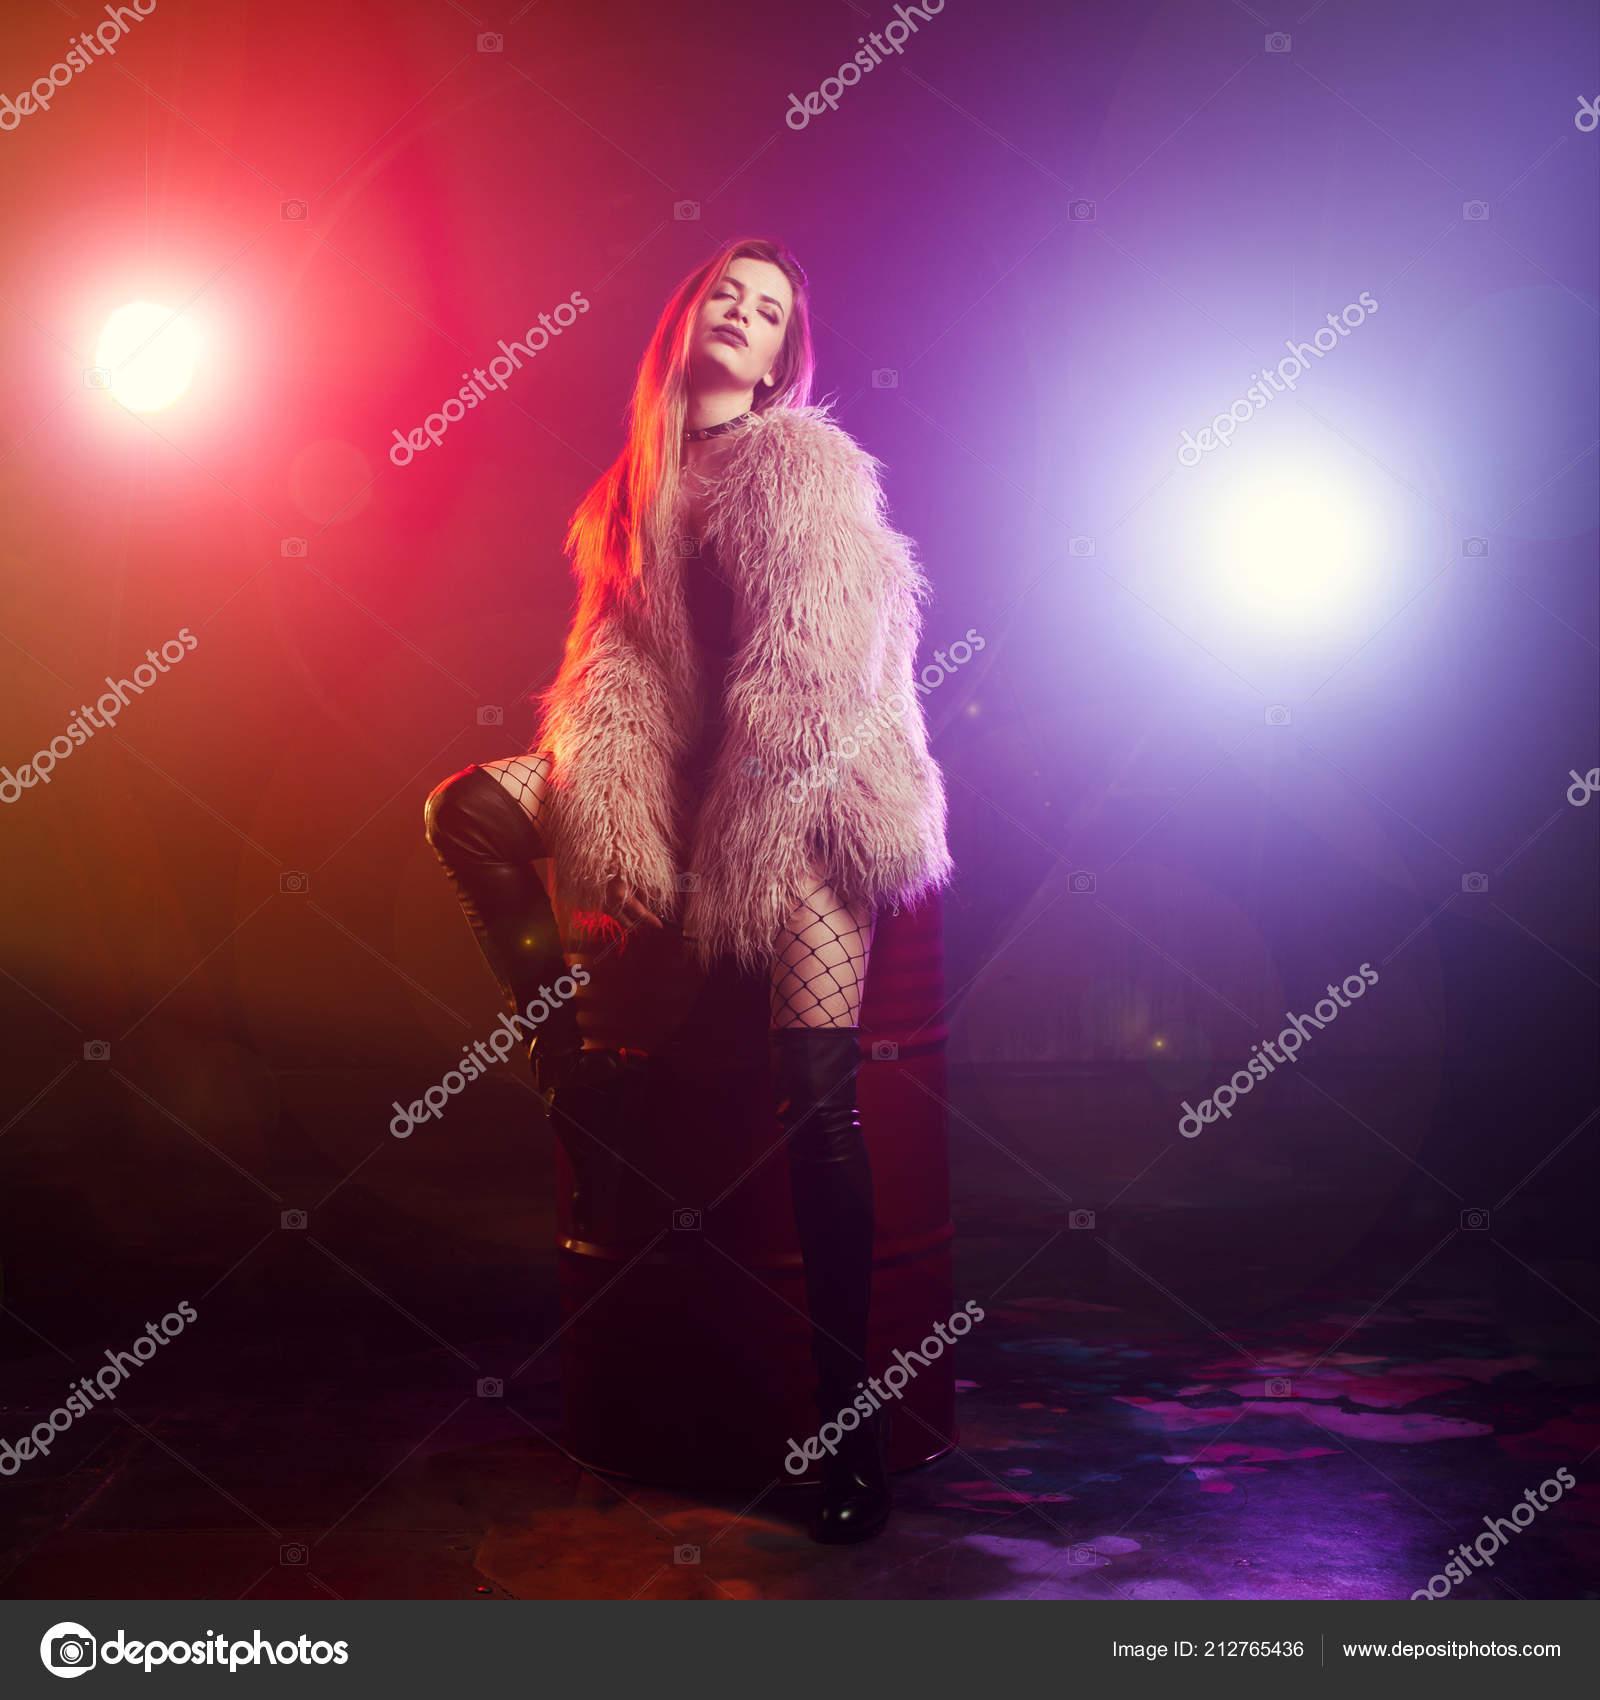 a76e220bfbb Μοντέρνο κορίτσι χορό σε ένα αφράτο ροζ παλτό — Φωτογραφία Αρχείου ...